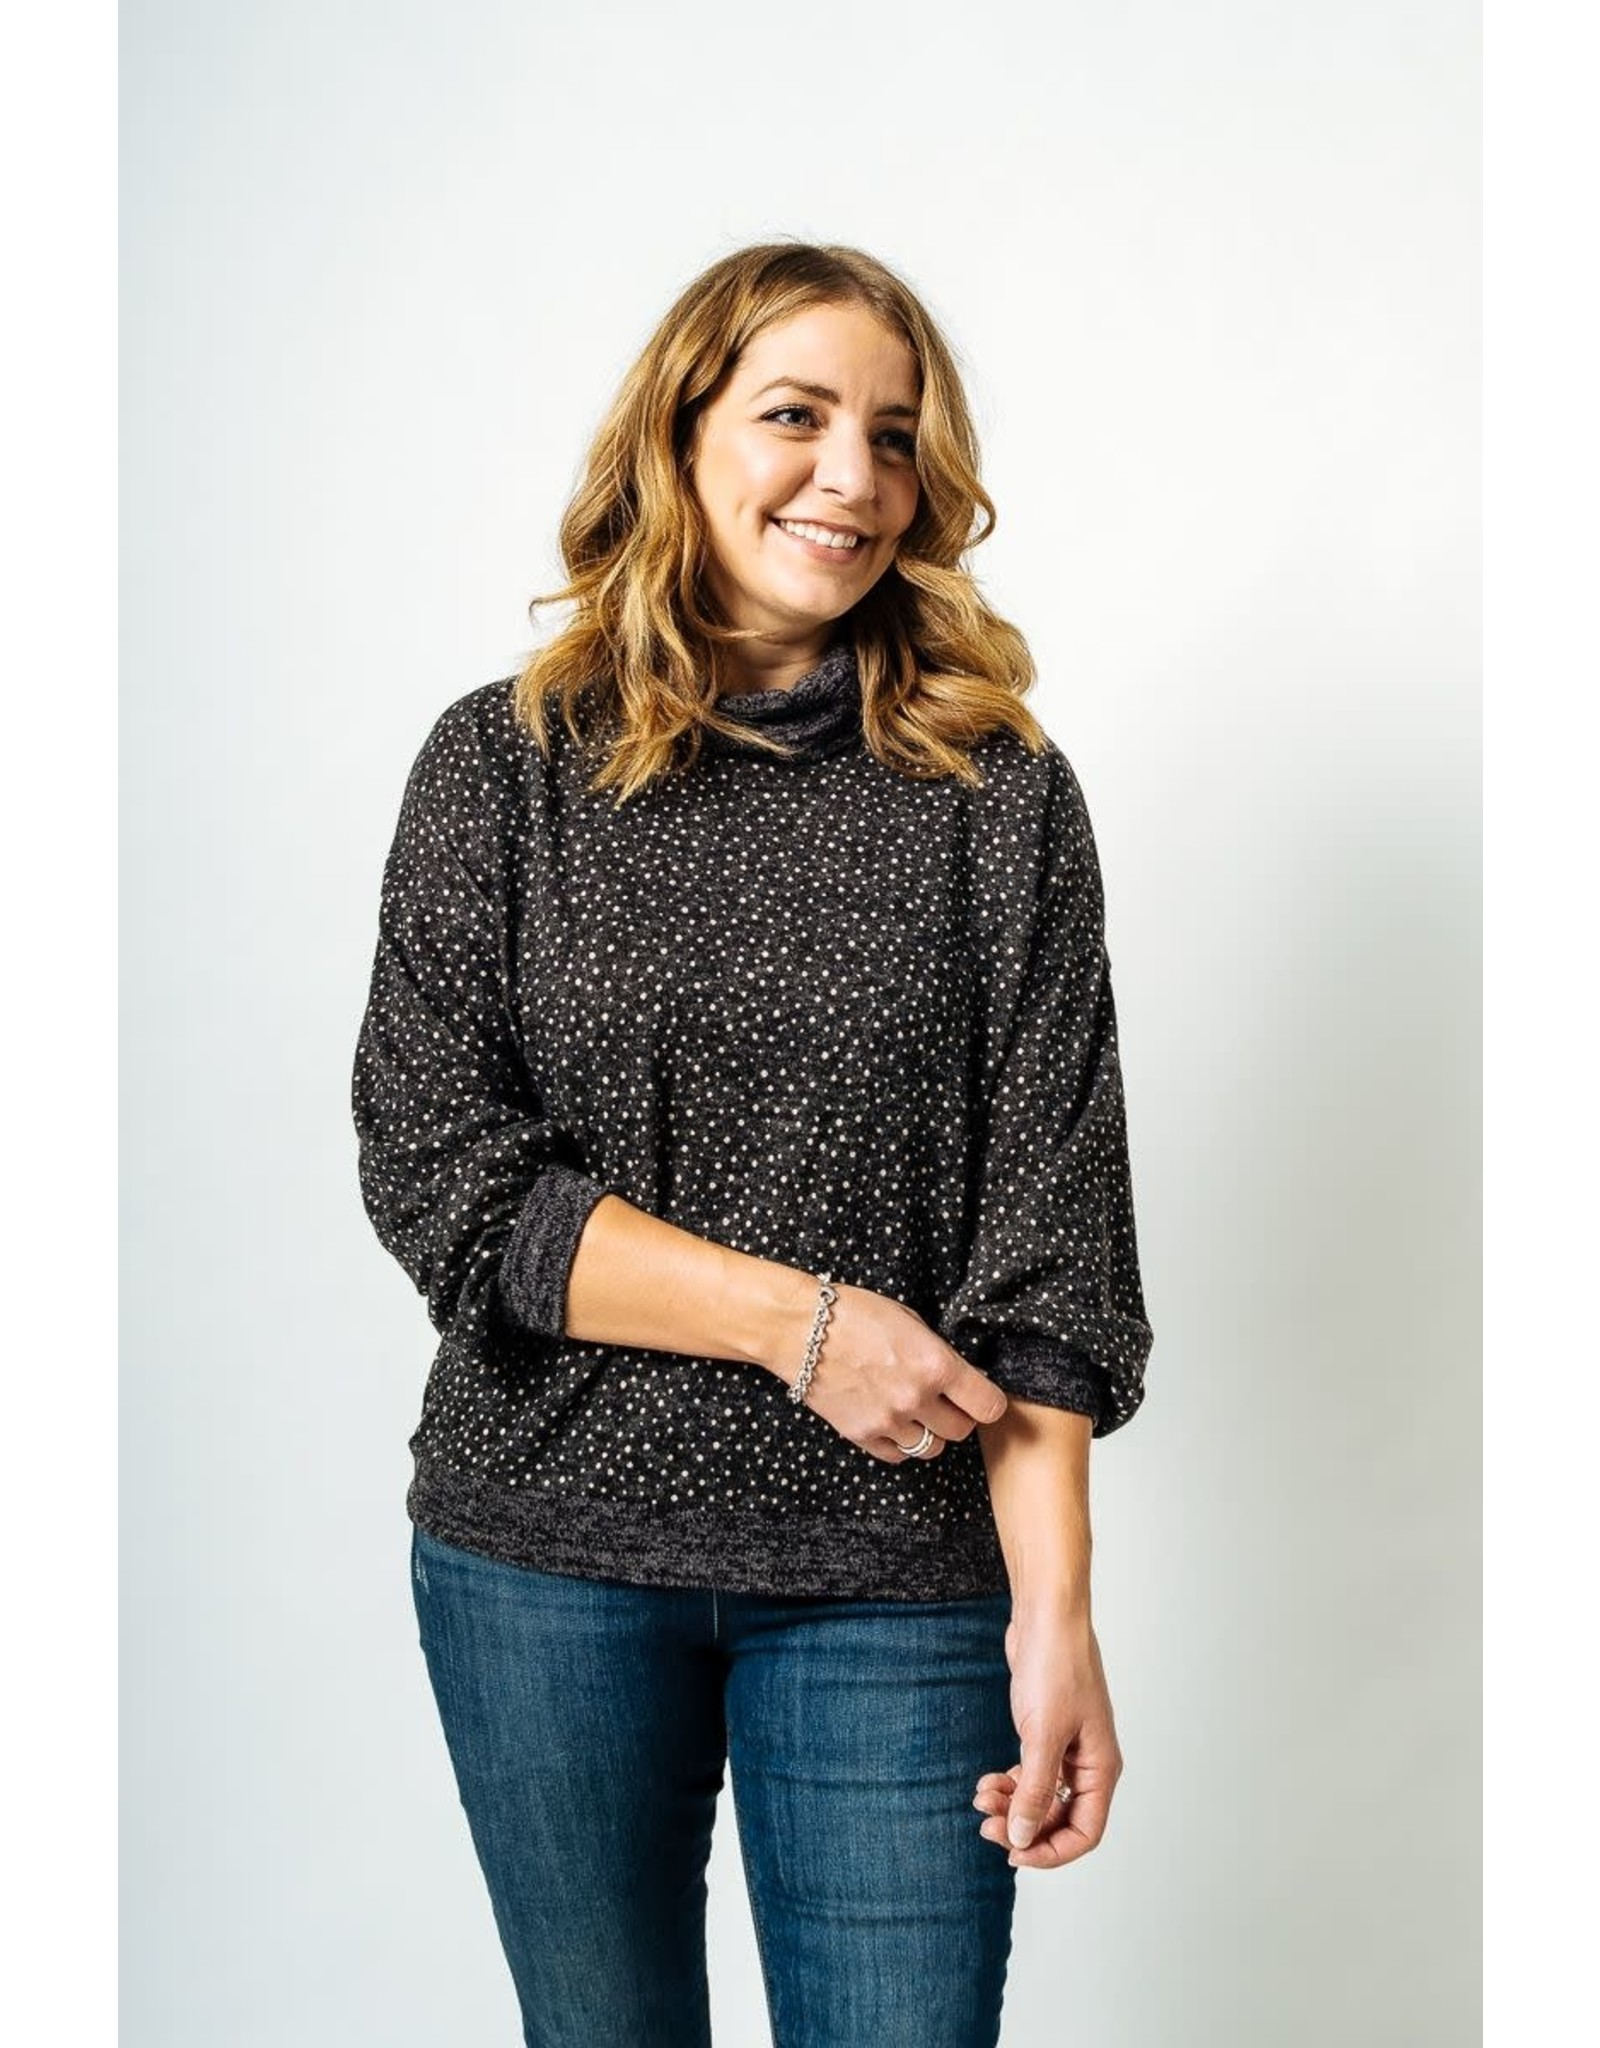 Papillon Papillon - Spotted sweater